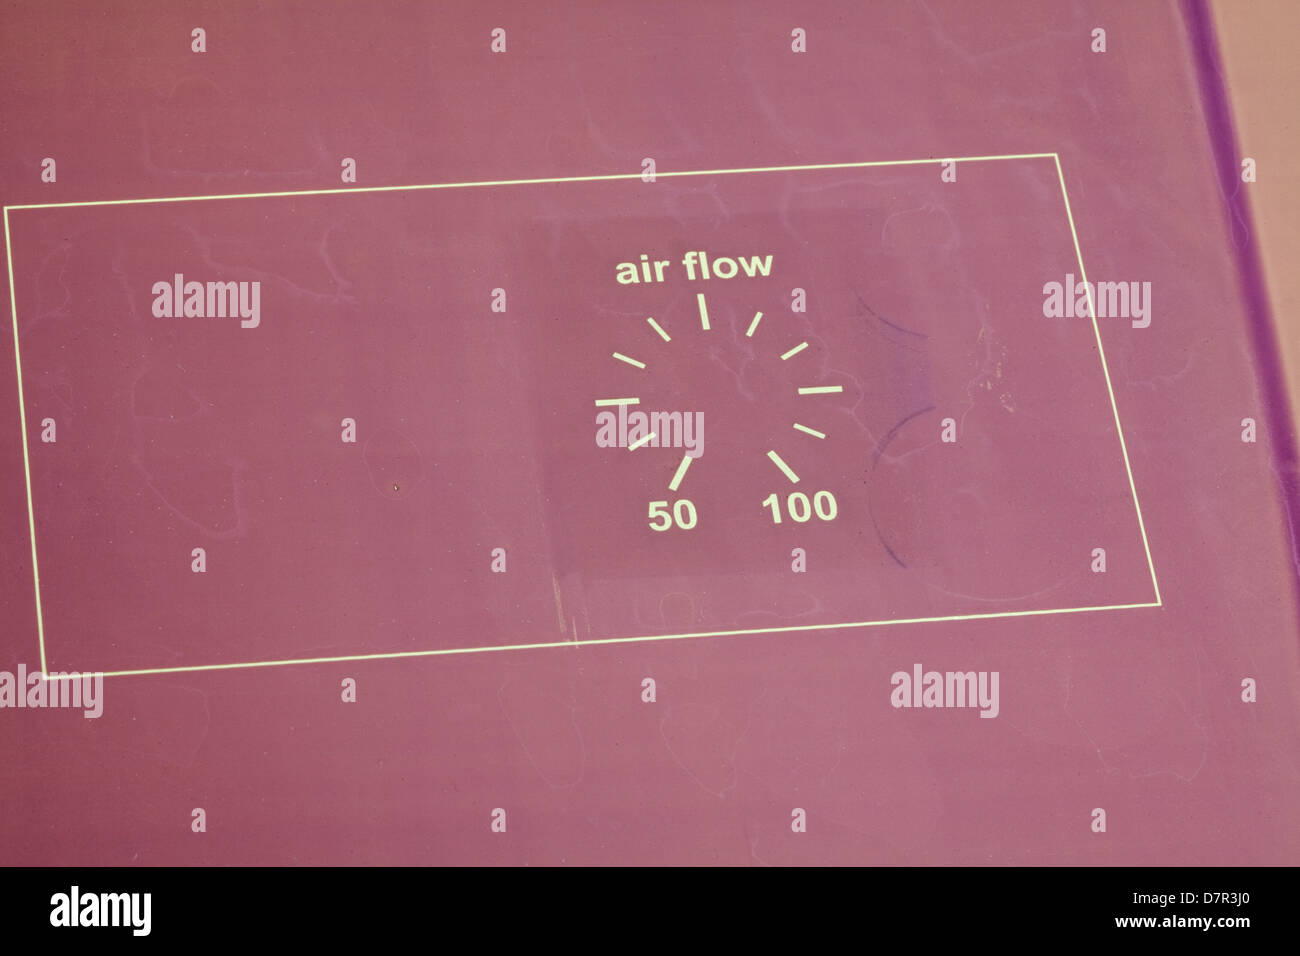 Screen printing - Stock Image